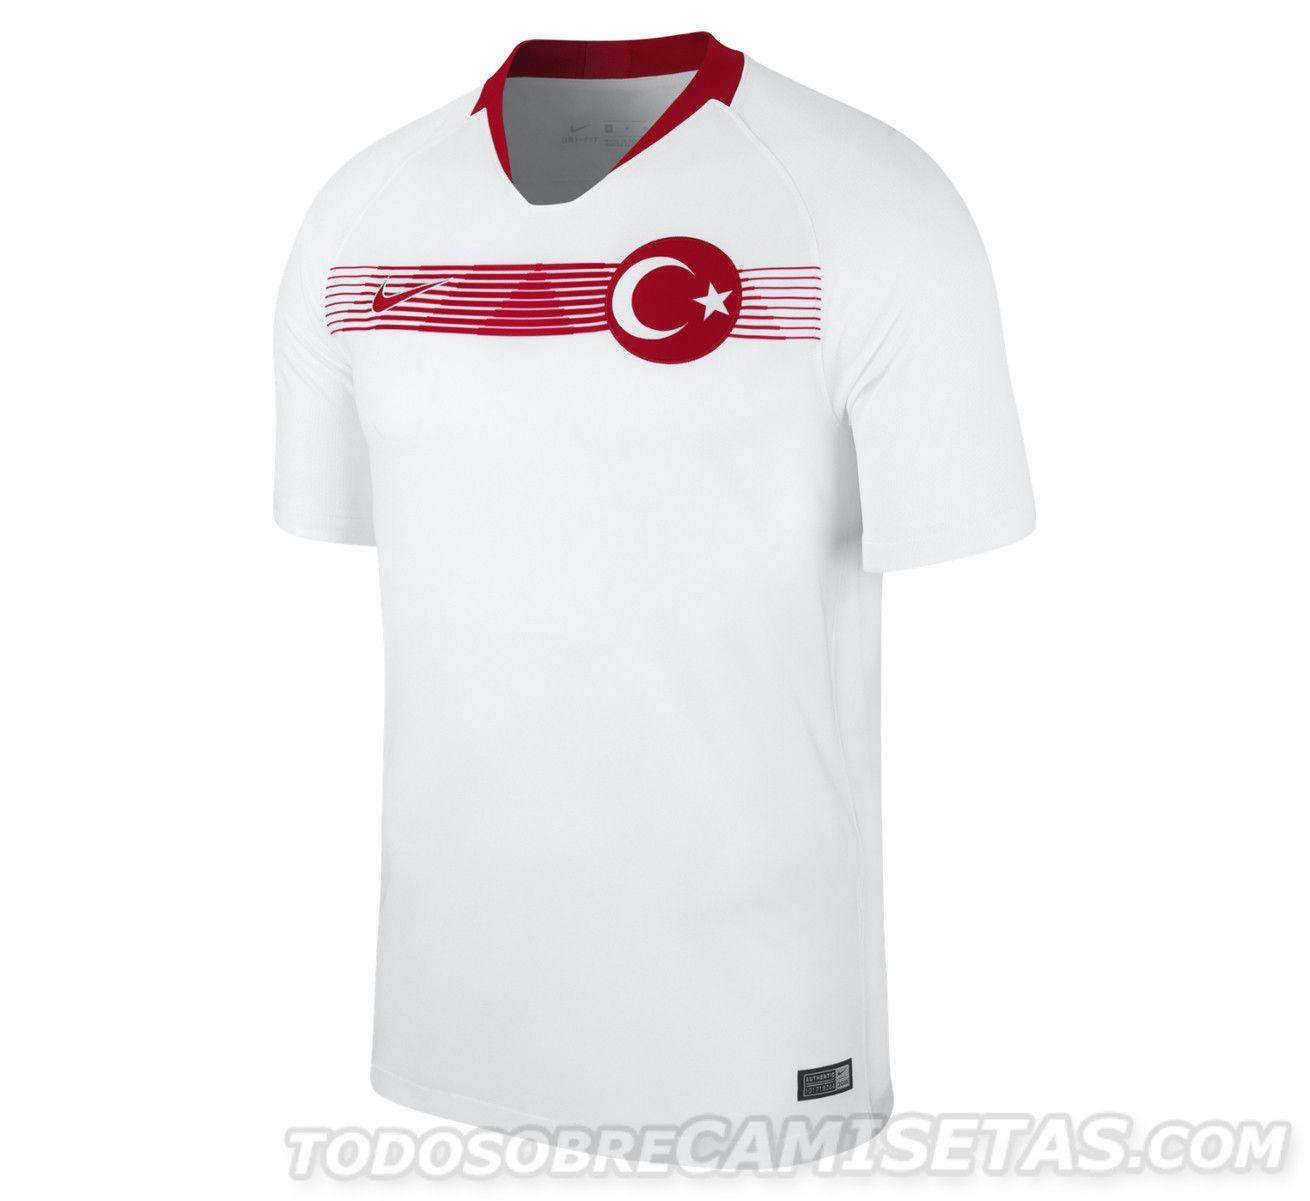 f54e783d56a Turkey 2018 Nike Kits - Todo Sobre Camisetas | Jersey Design IDea ...